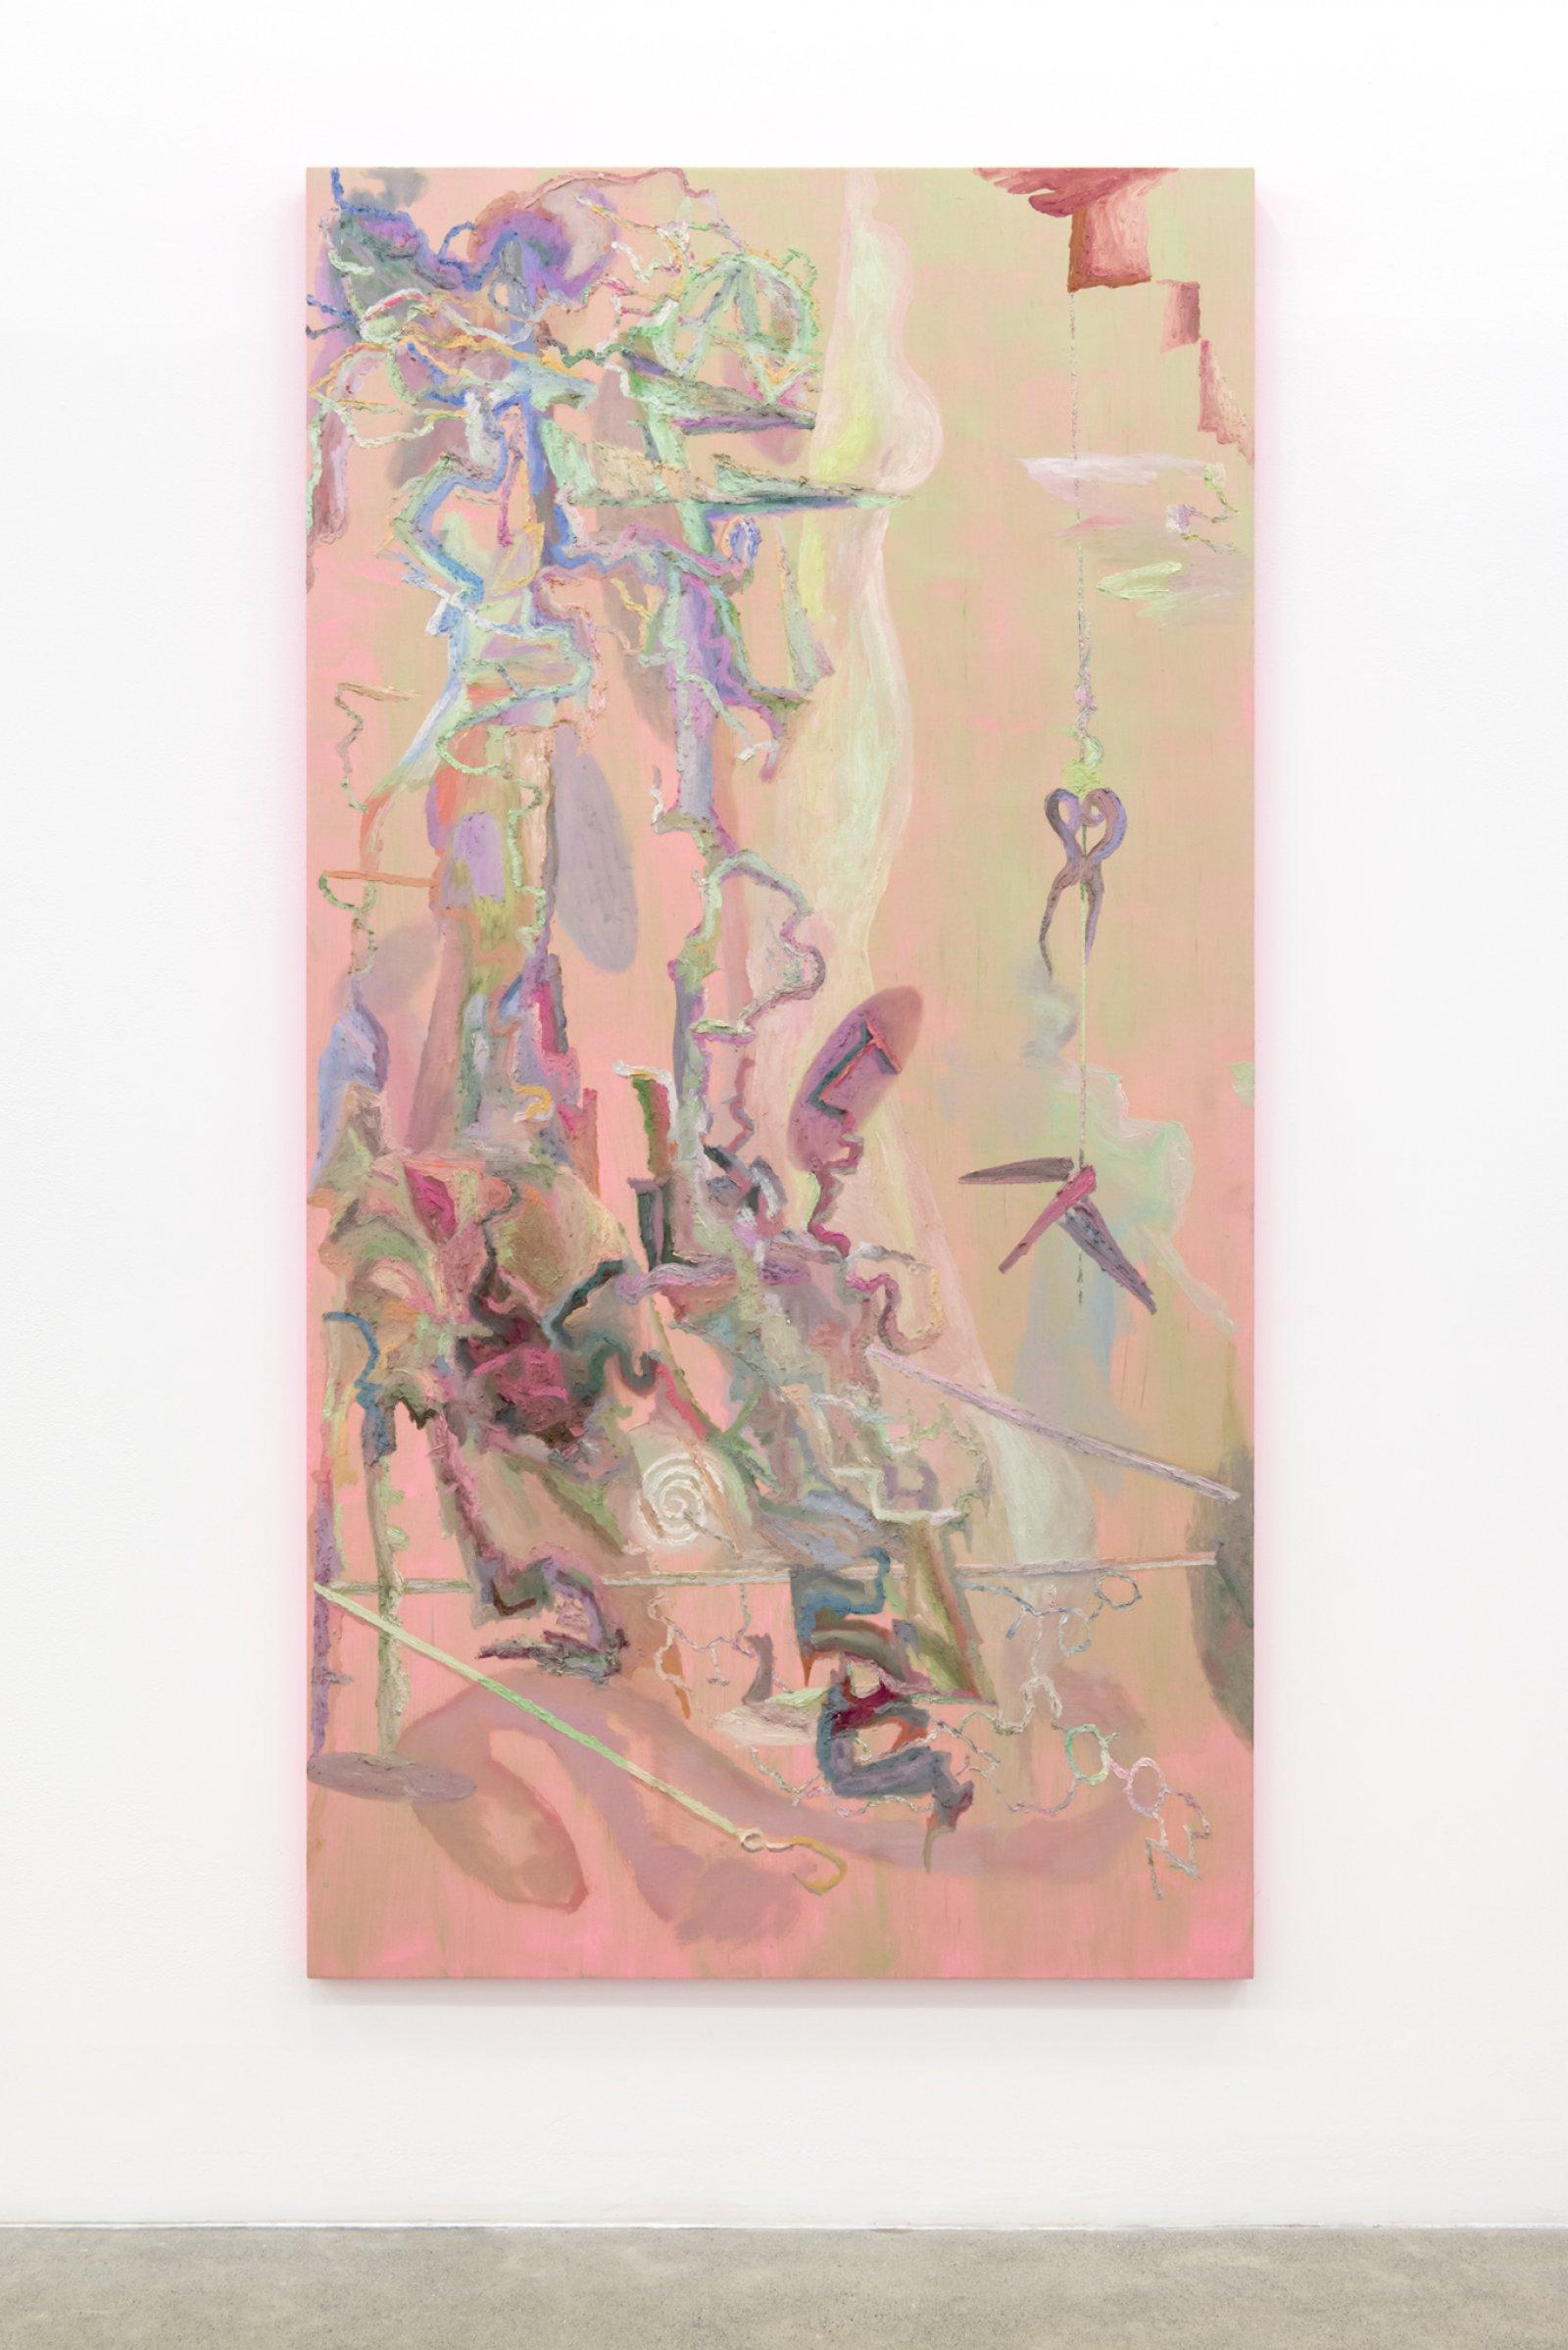 Rebecca Brewer,Bones Stuck Underground, 2017, oil and fabric on panel, 83 x 43 in. (211 x 109 cm)